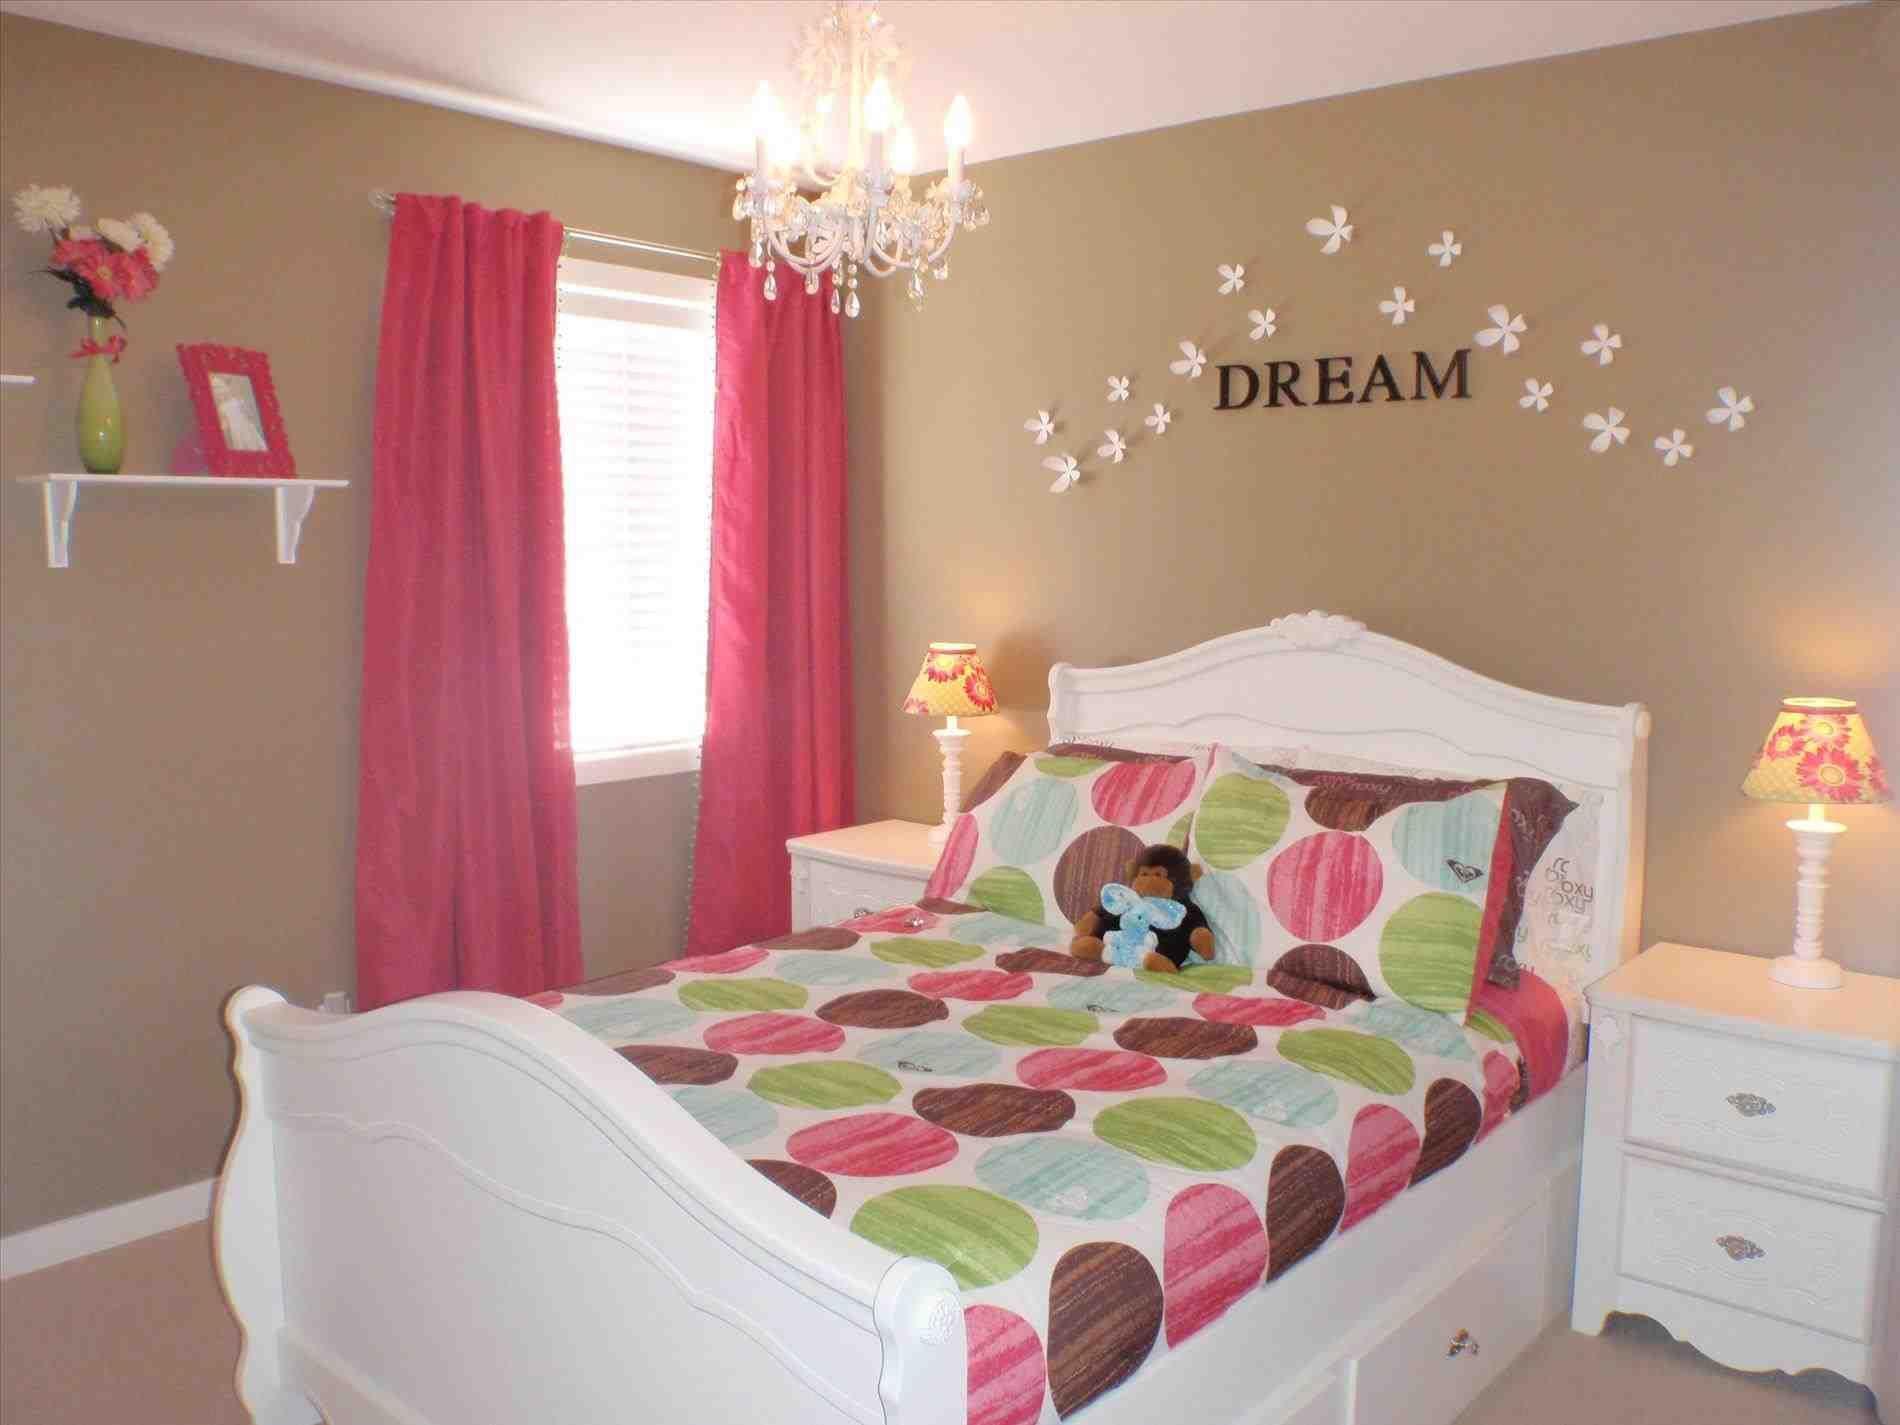 Bedrooms Designs For Girls New Post Bedroom Designs For Girls Children Has Been Published